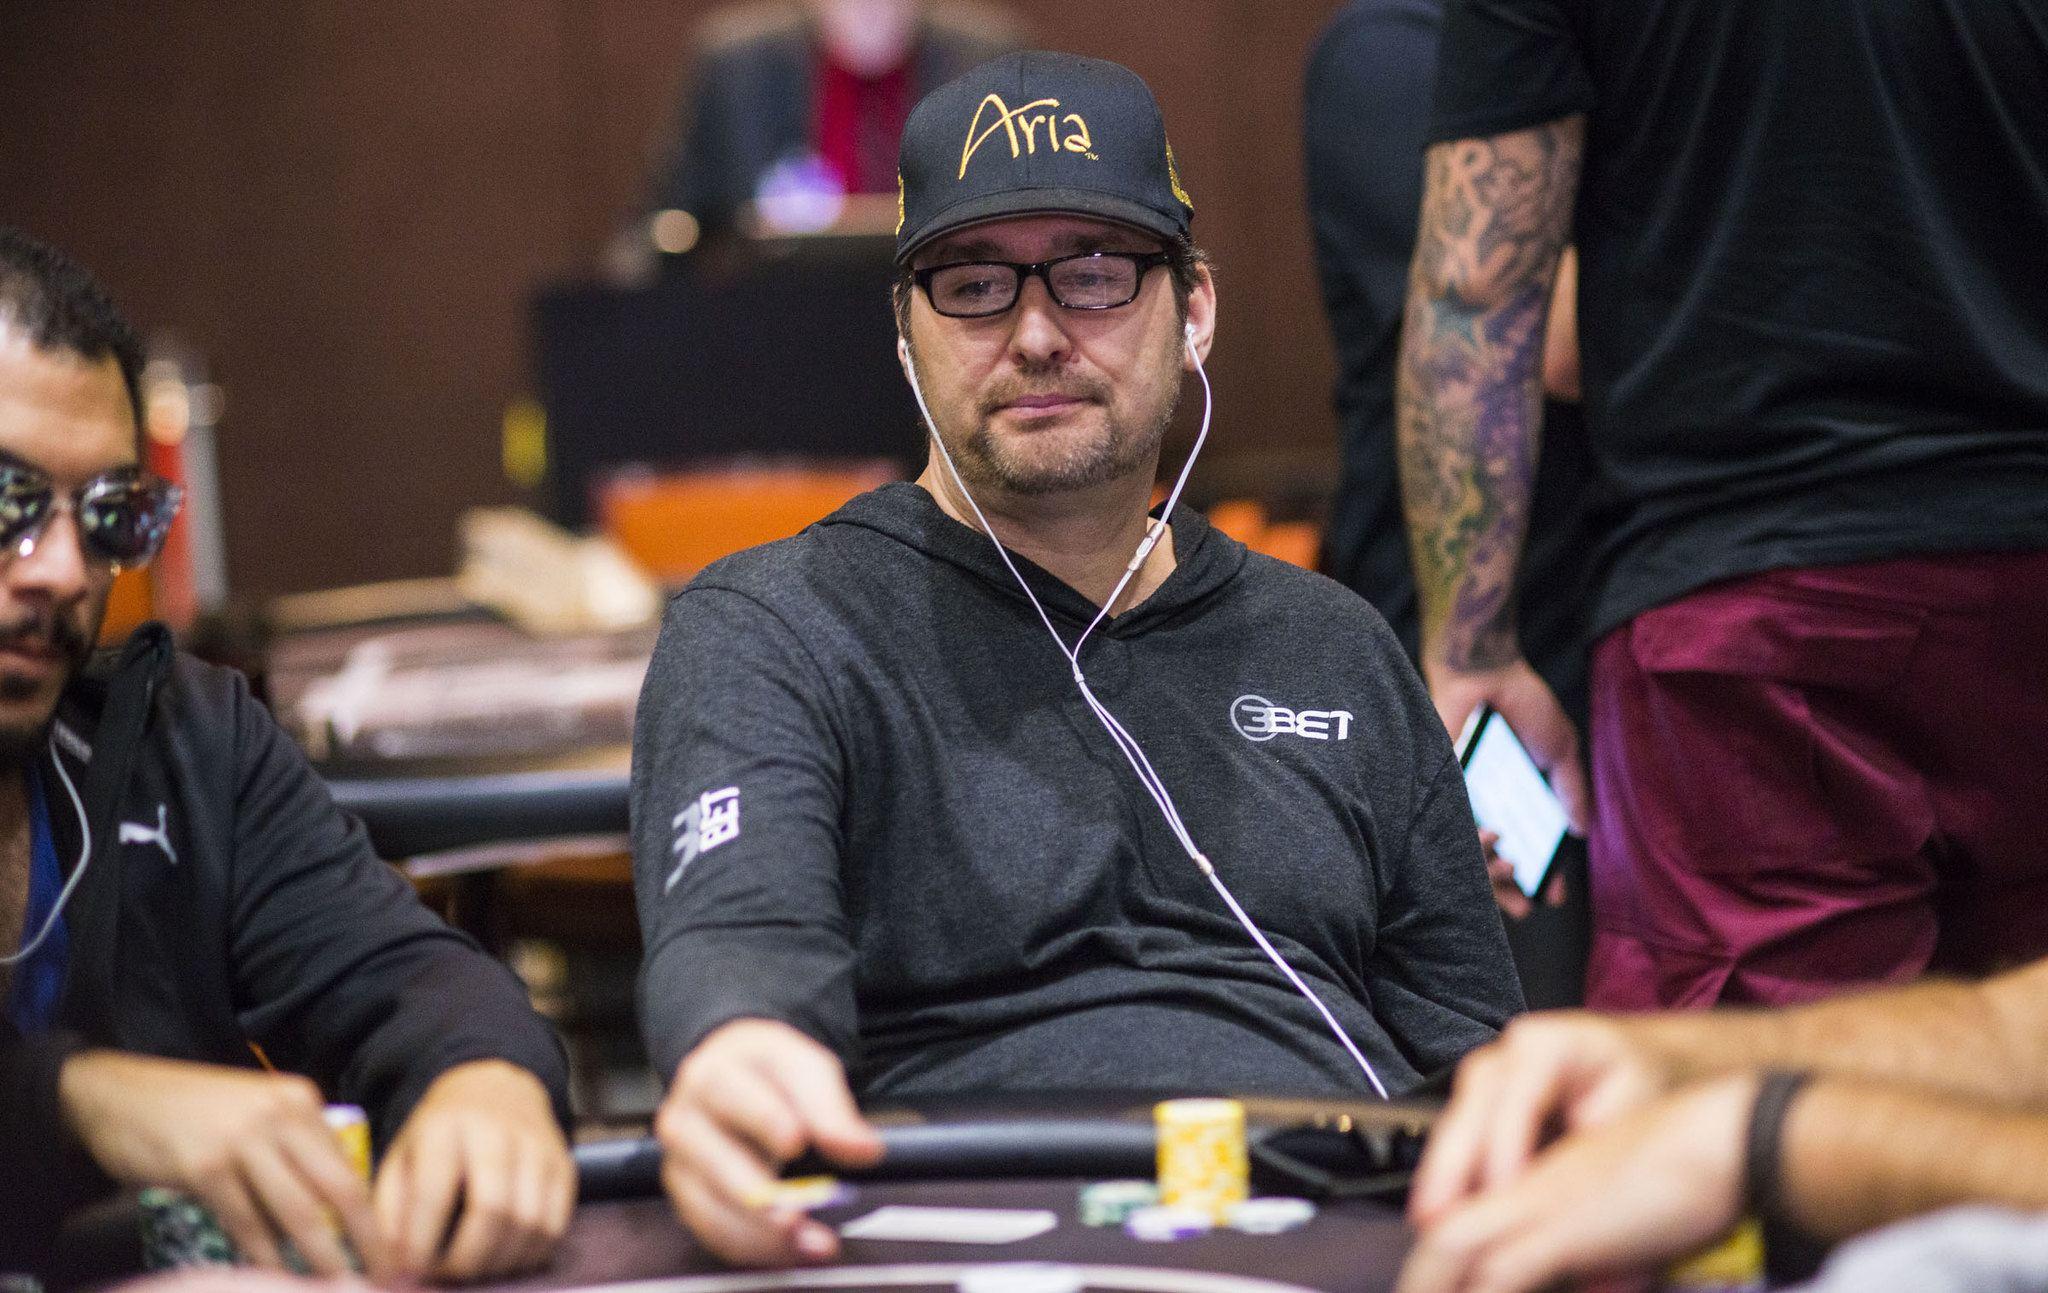 Top 10 Worst Trash Talkers In Poker